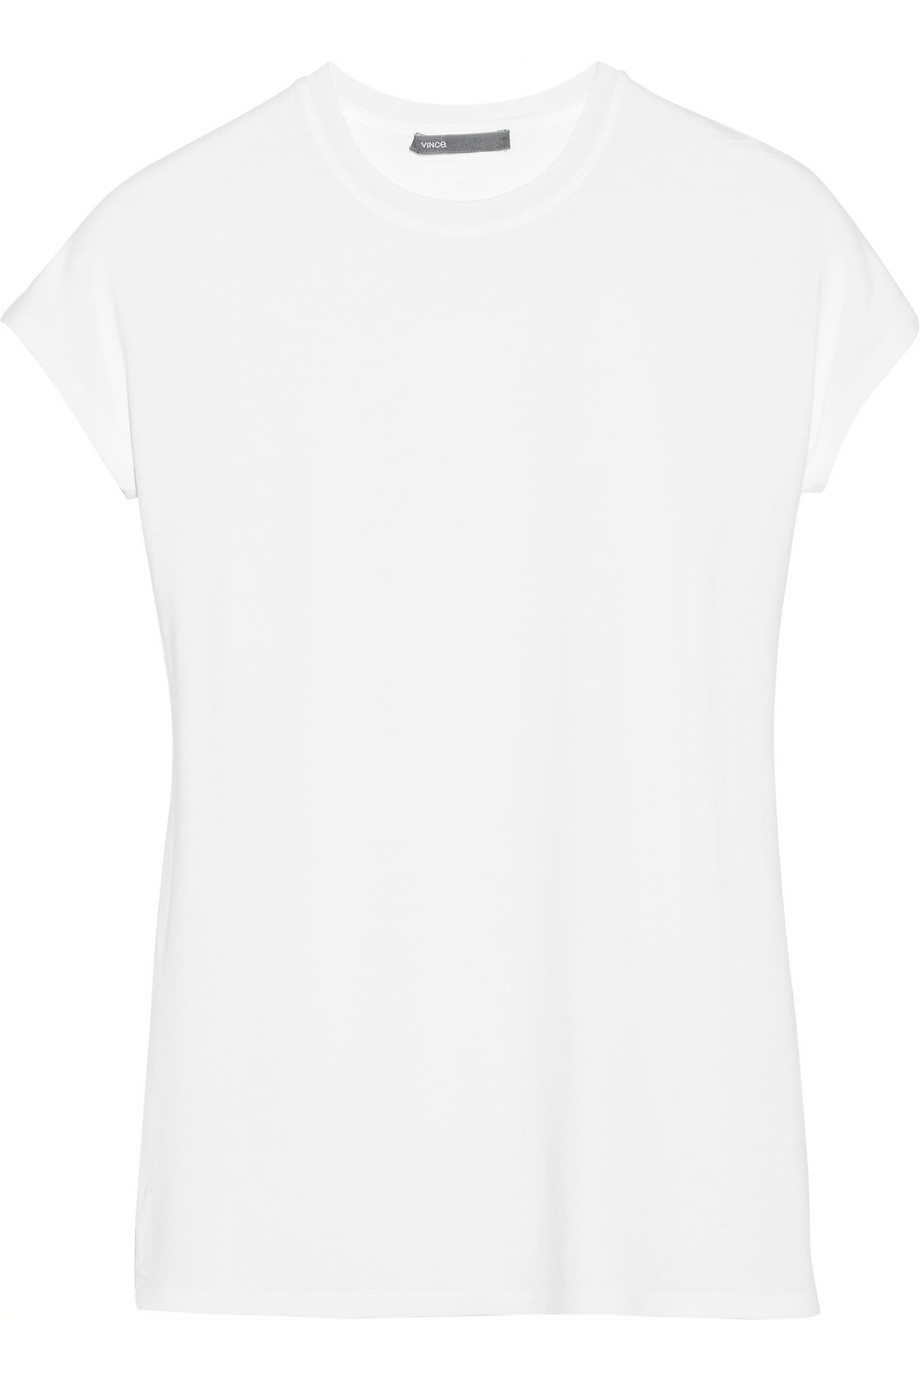 Micro Modal-blend jersey T-shirt   Vince   40% off   THE OUTNET